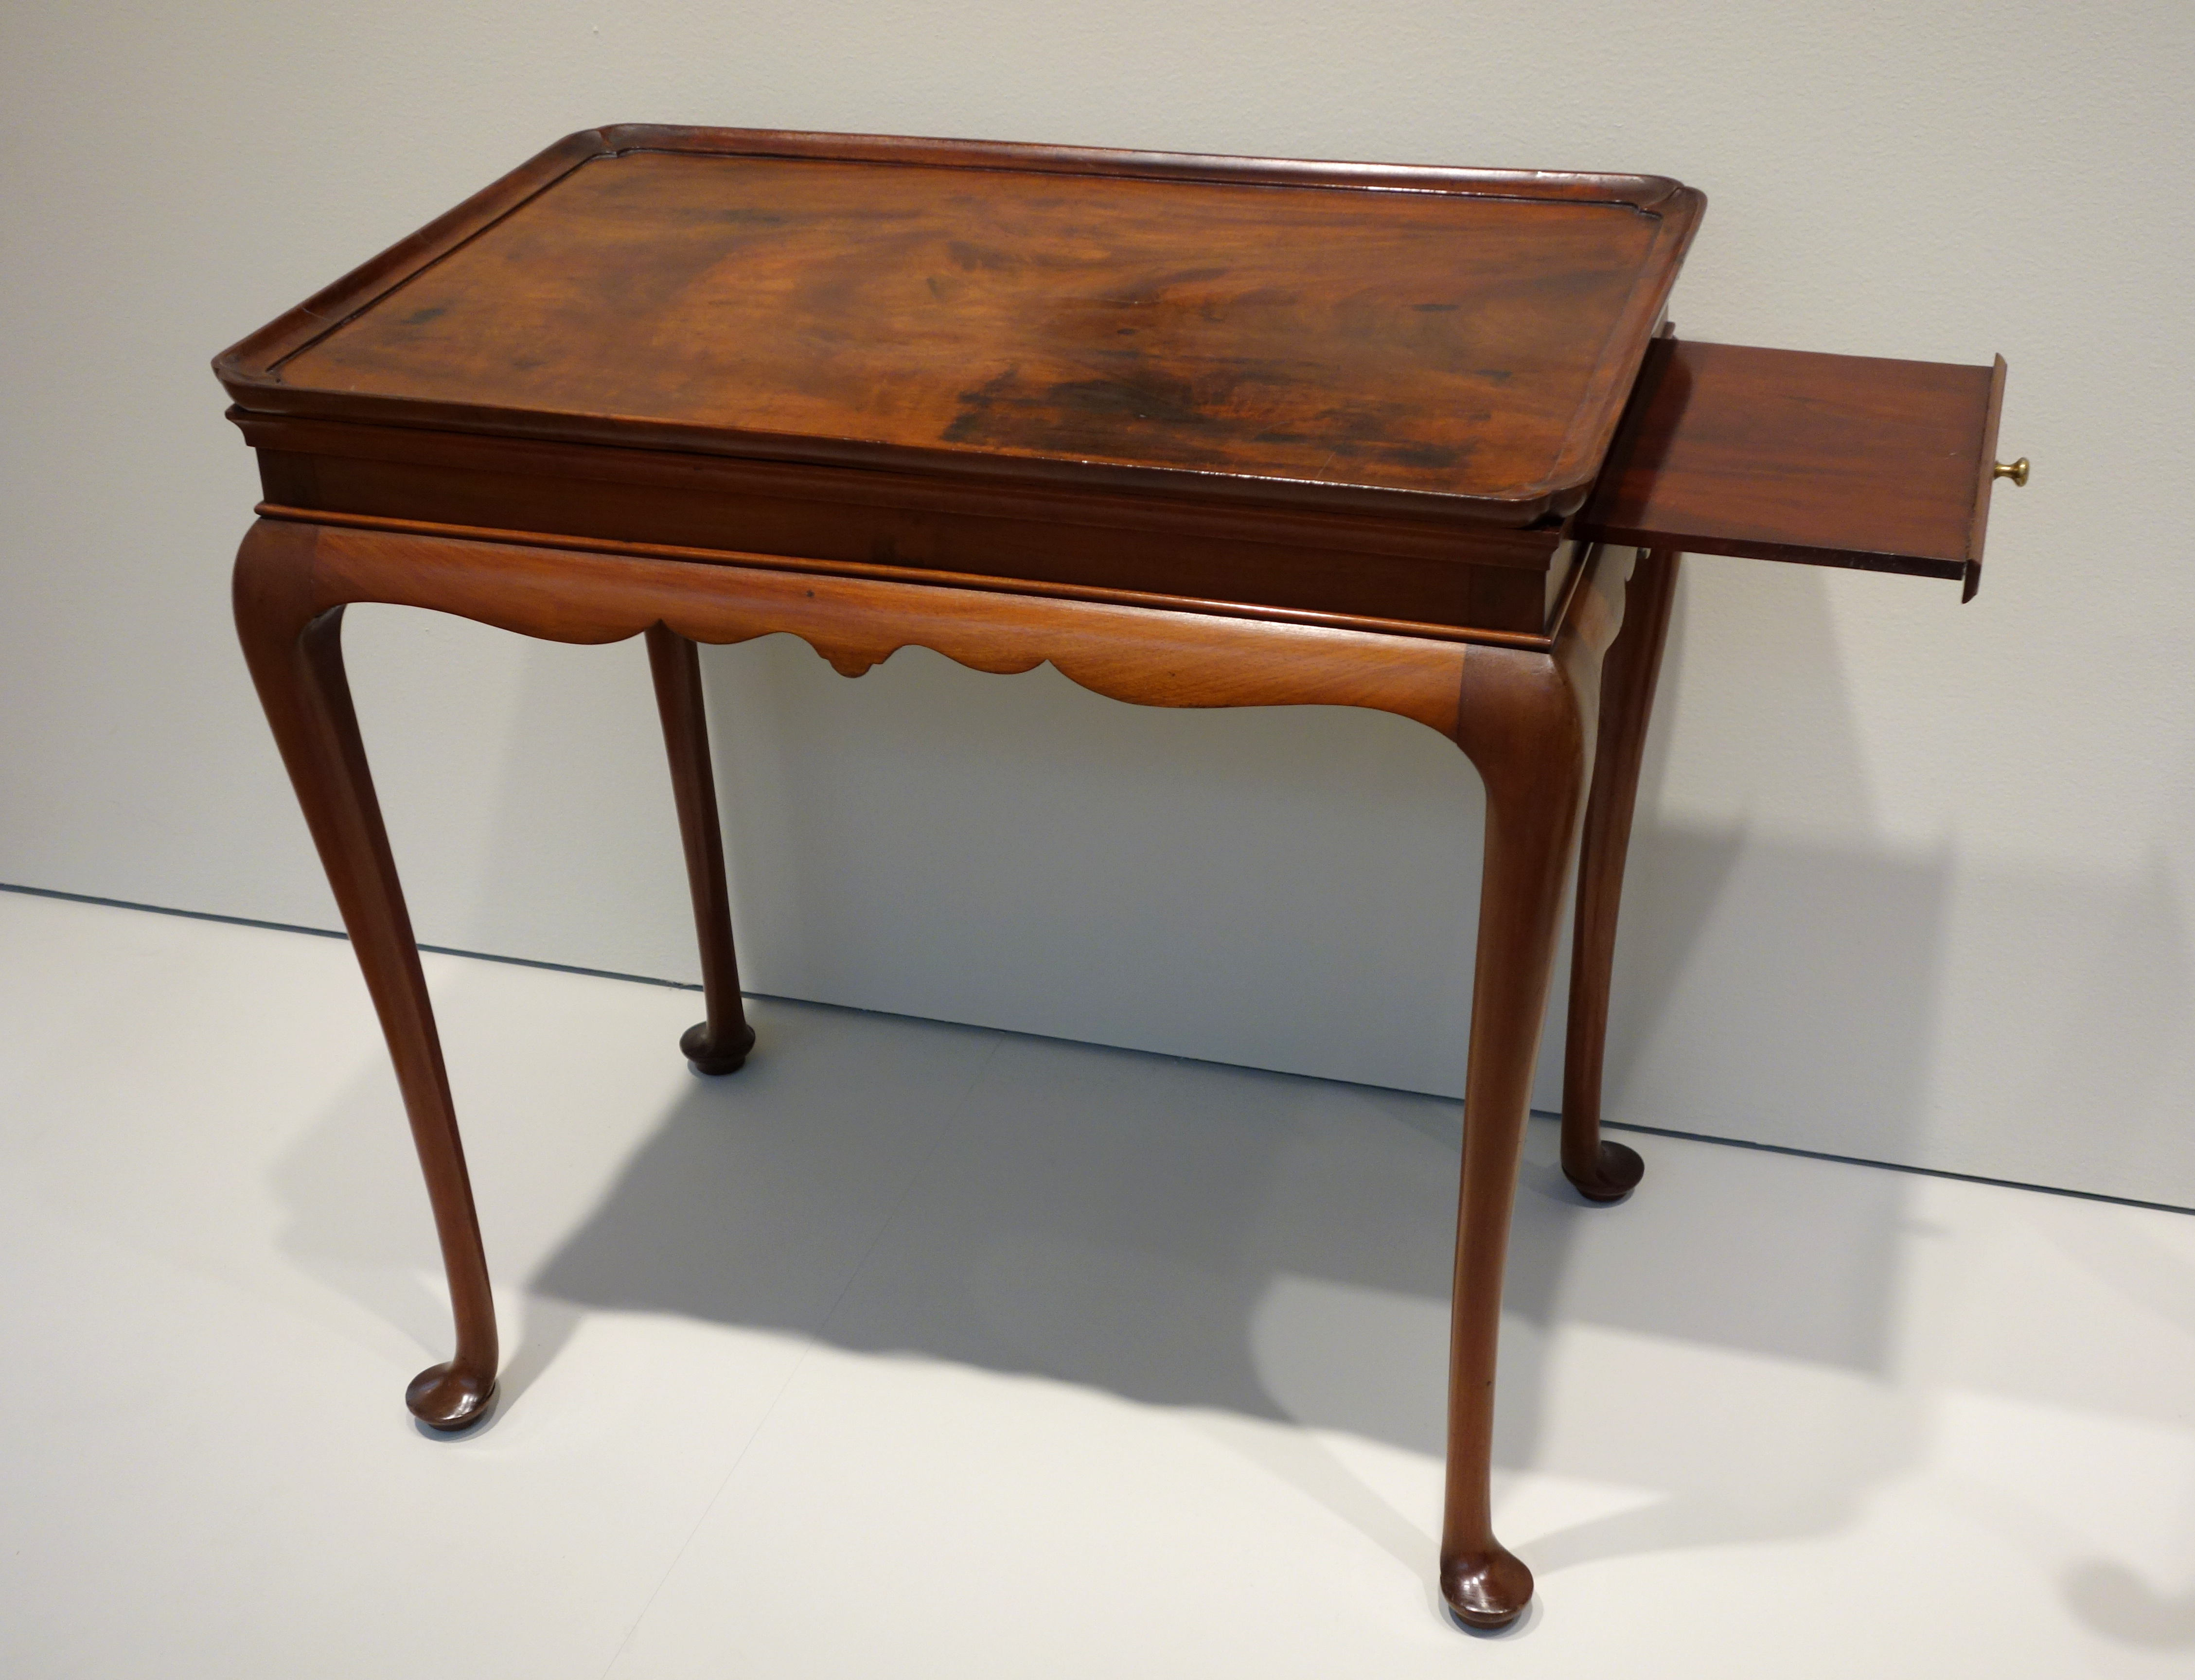 File:Tea Table, Boston, 1735 1755, Mahogany With White Pine